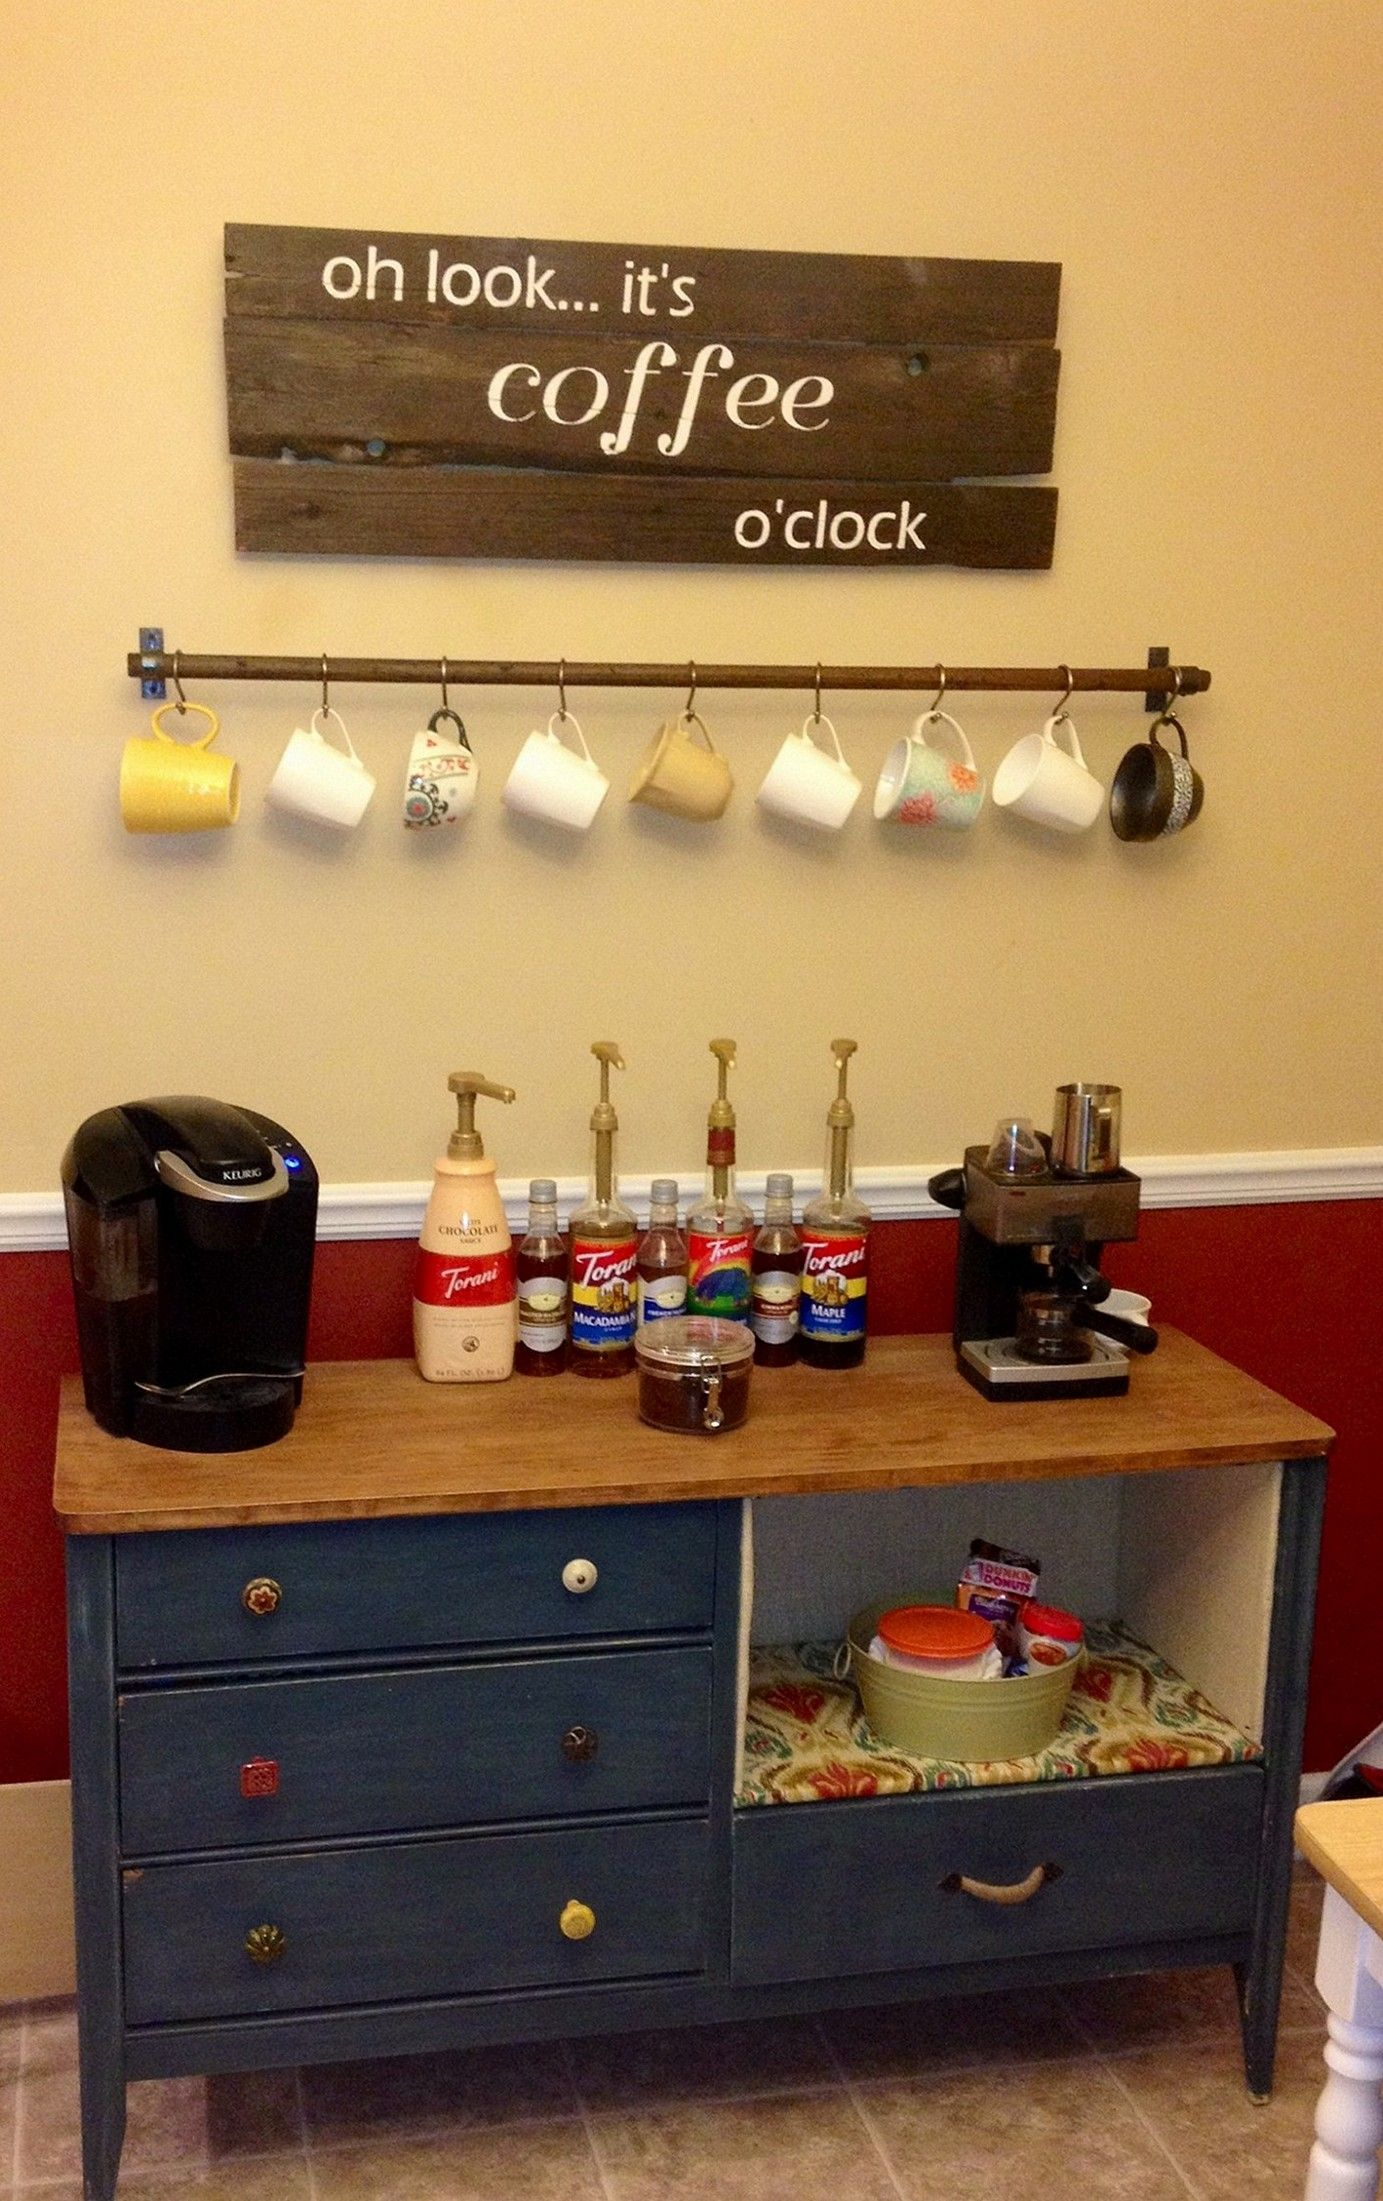 20 Handy Coffee Bar Ideas for Your Home | Coffee, Bar and Coffee bar ...